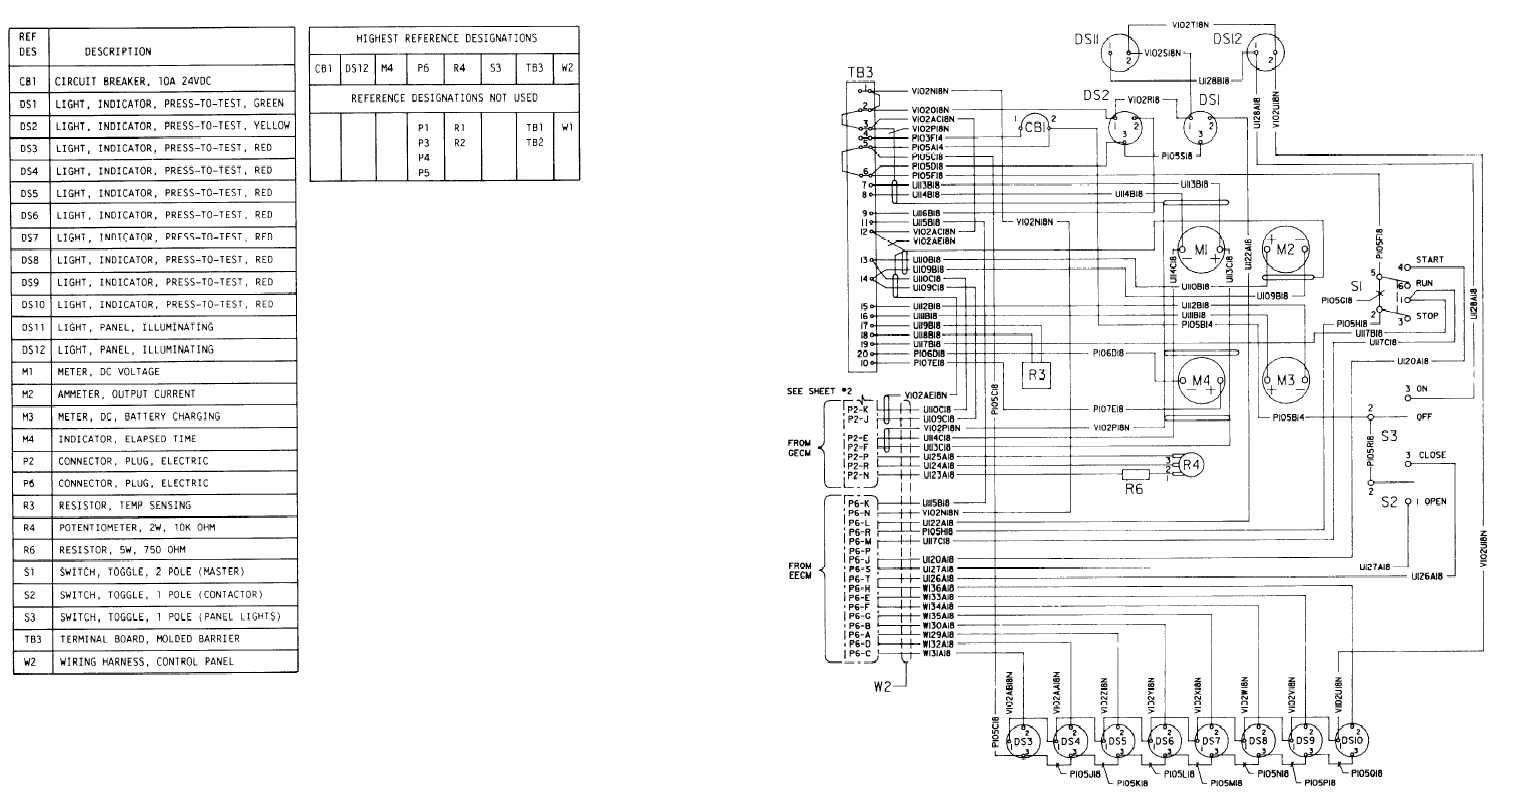 Diagram Dsx 1 Panel Wiring Diagram Full Version Hd Quality Wiring Diagram Diagramsalita Videoproiettori3d It